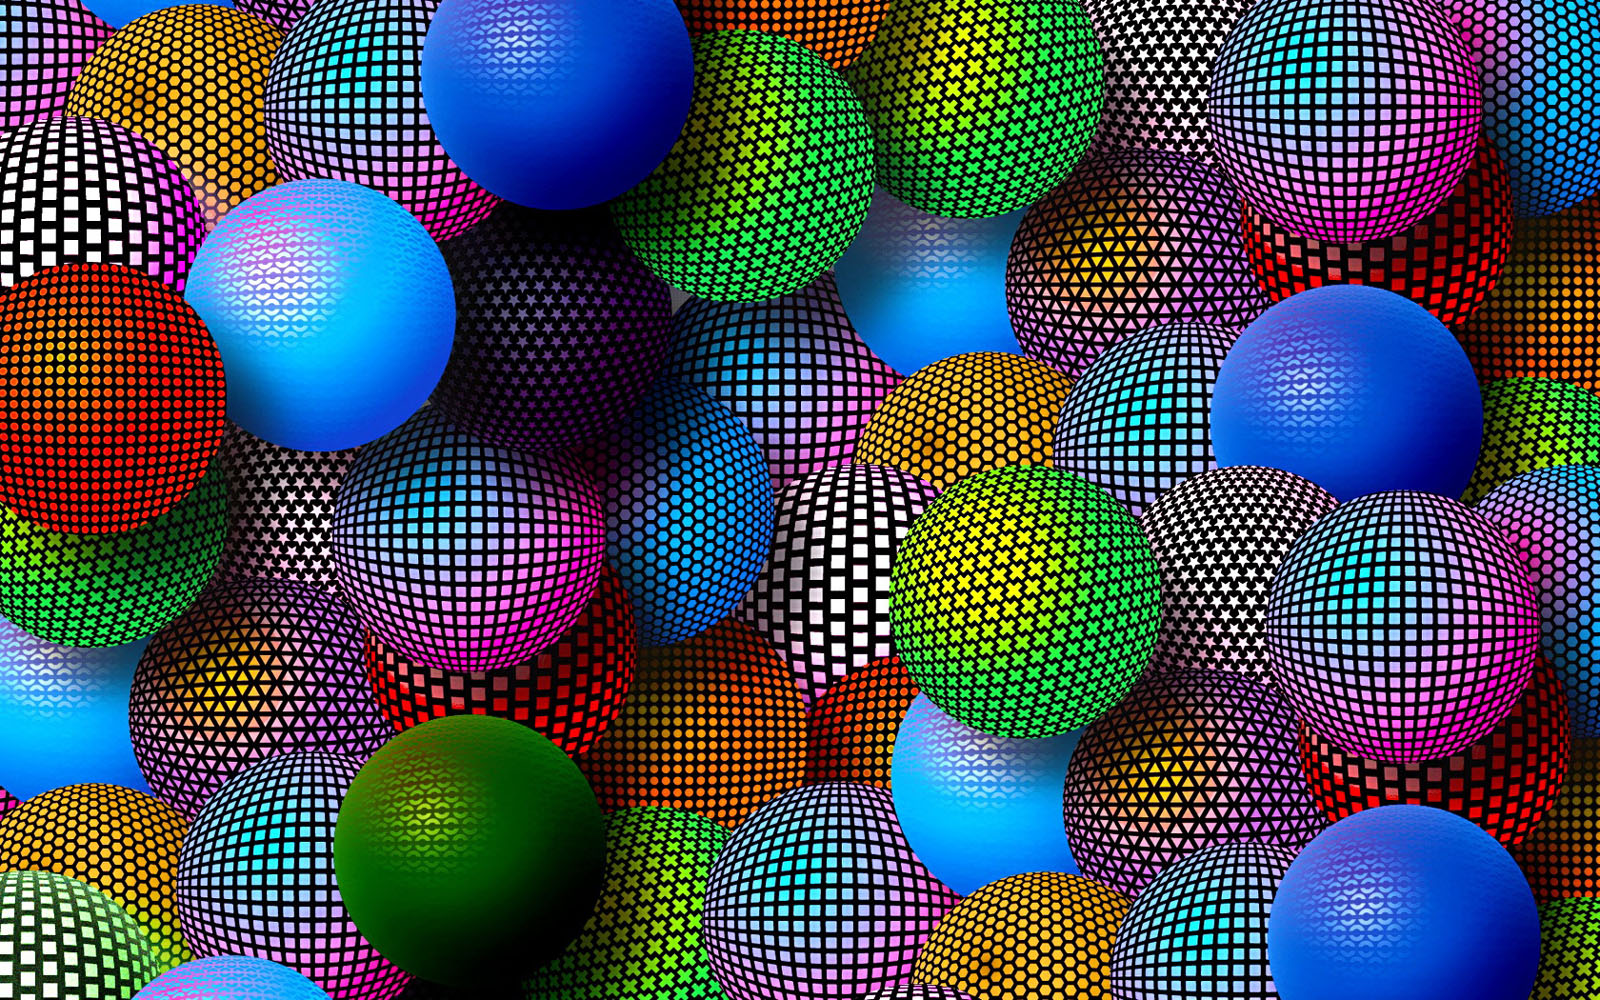 3d mosaic spheres desktop wallpapers